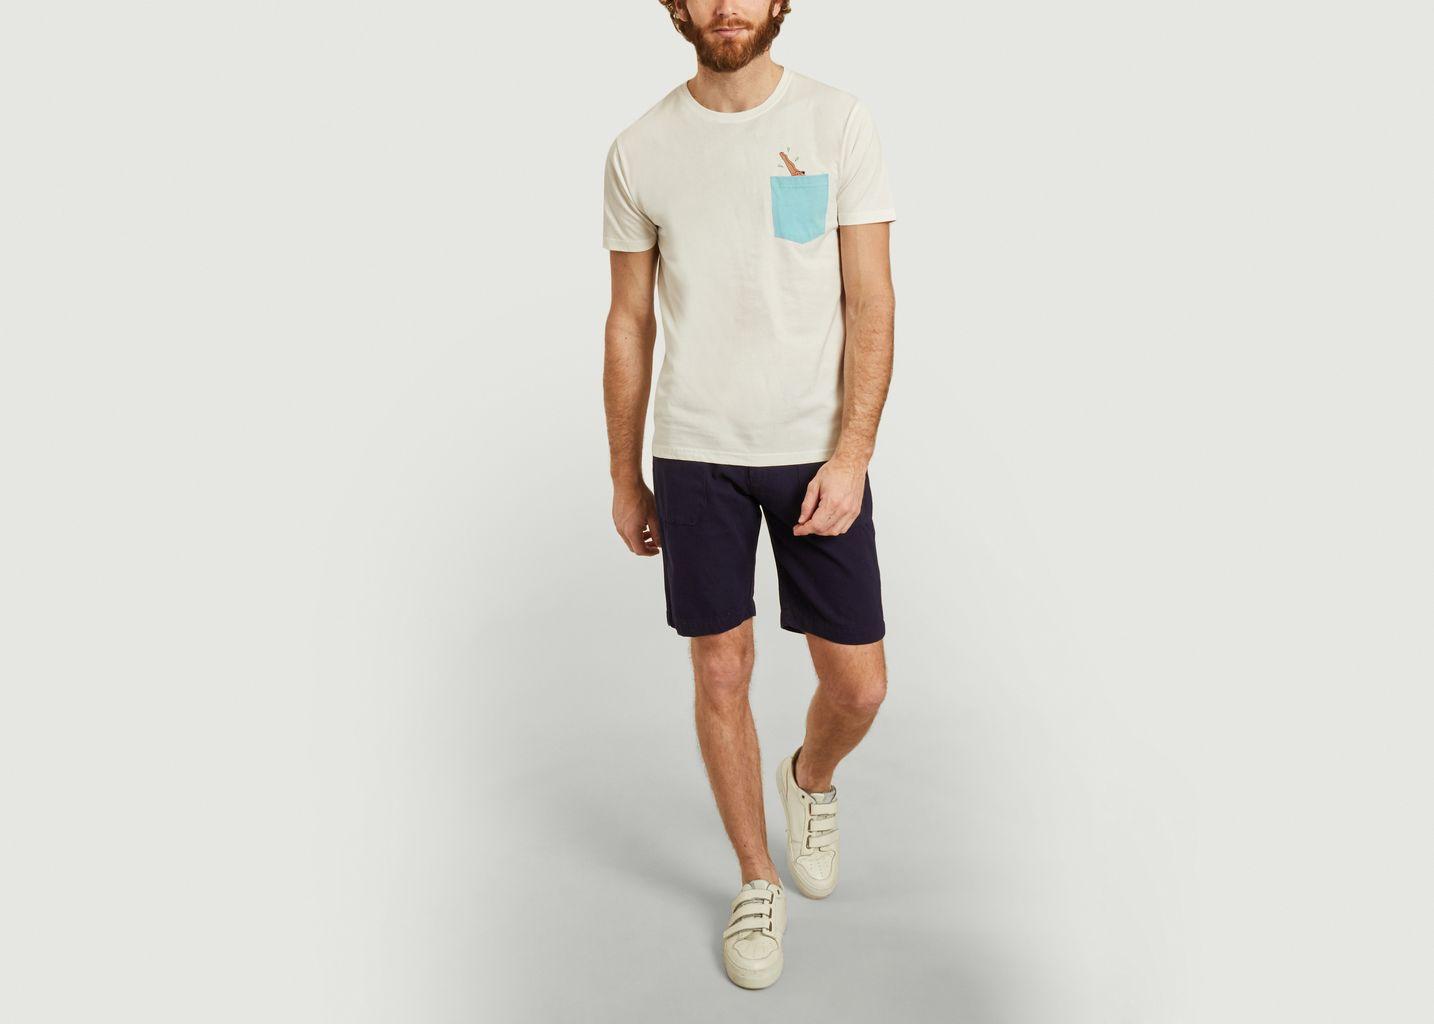 T-shirt Plongeon - Olow